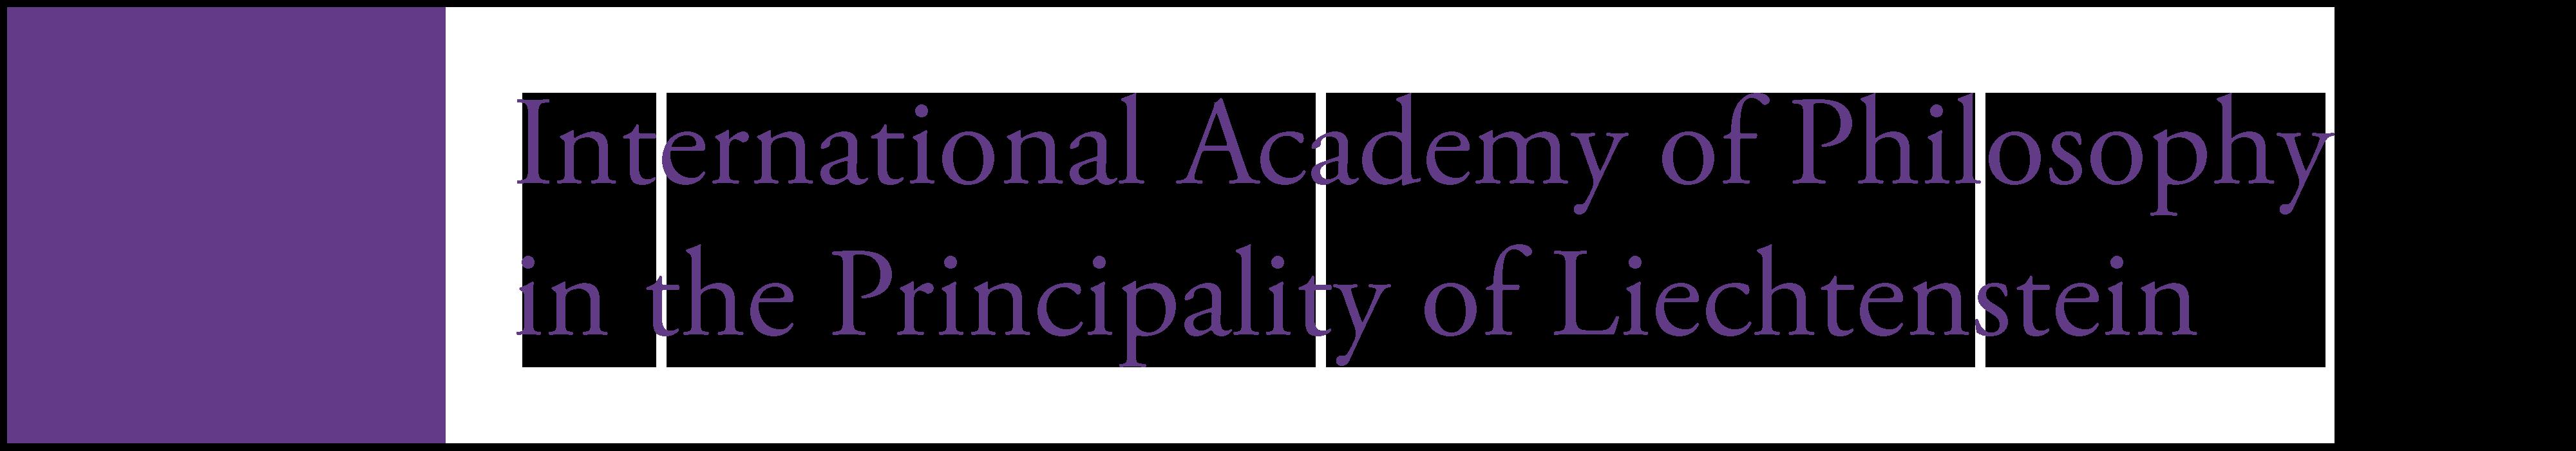 International Academy of Philosophy